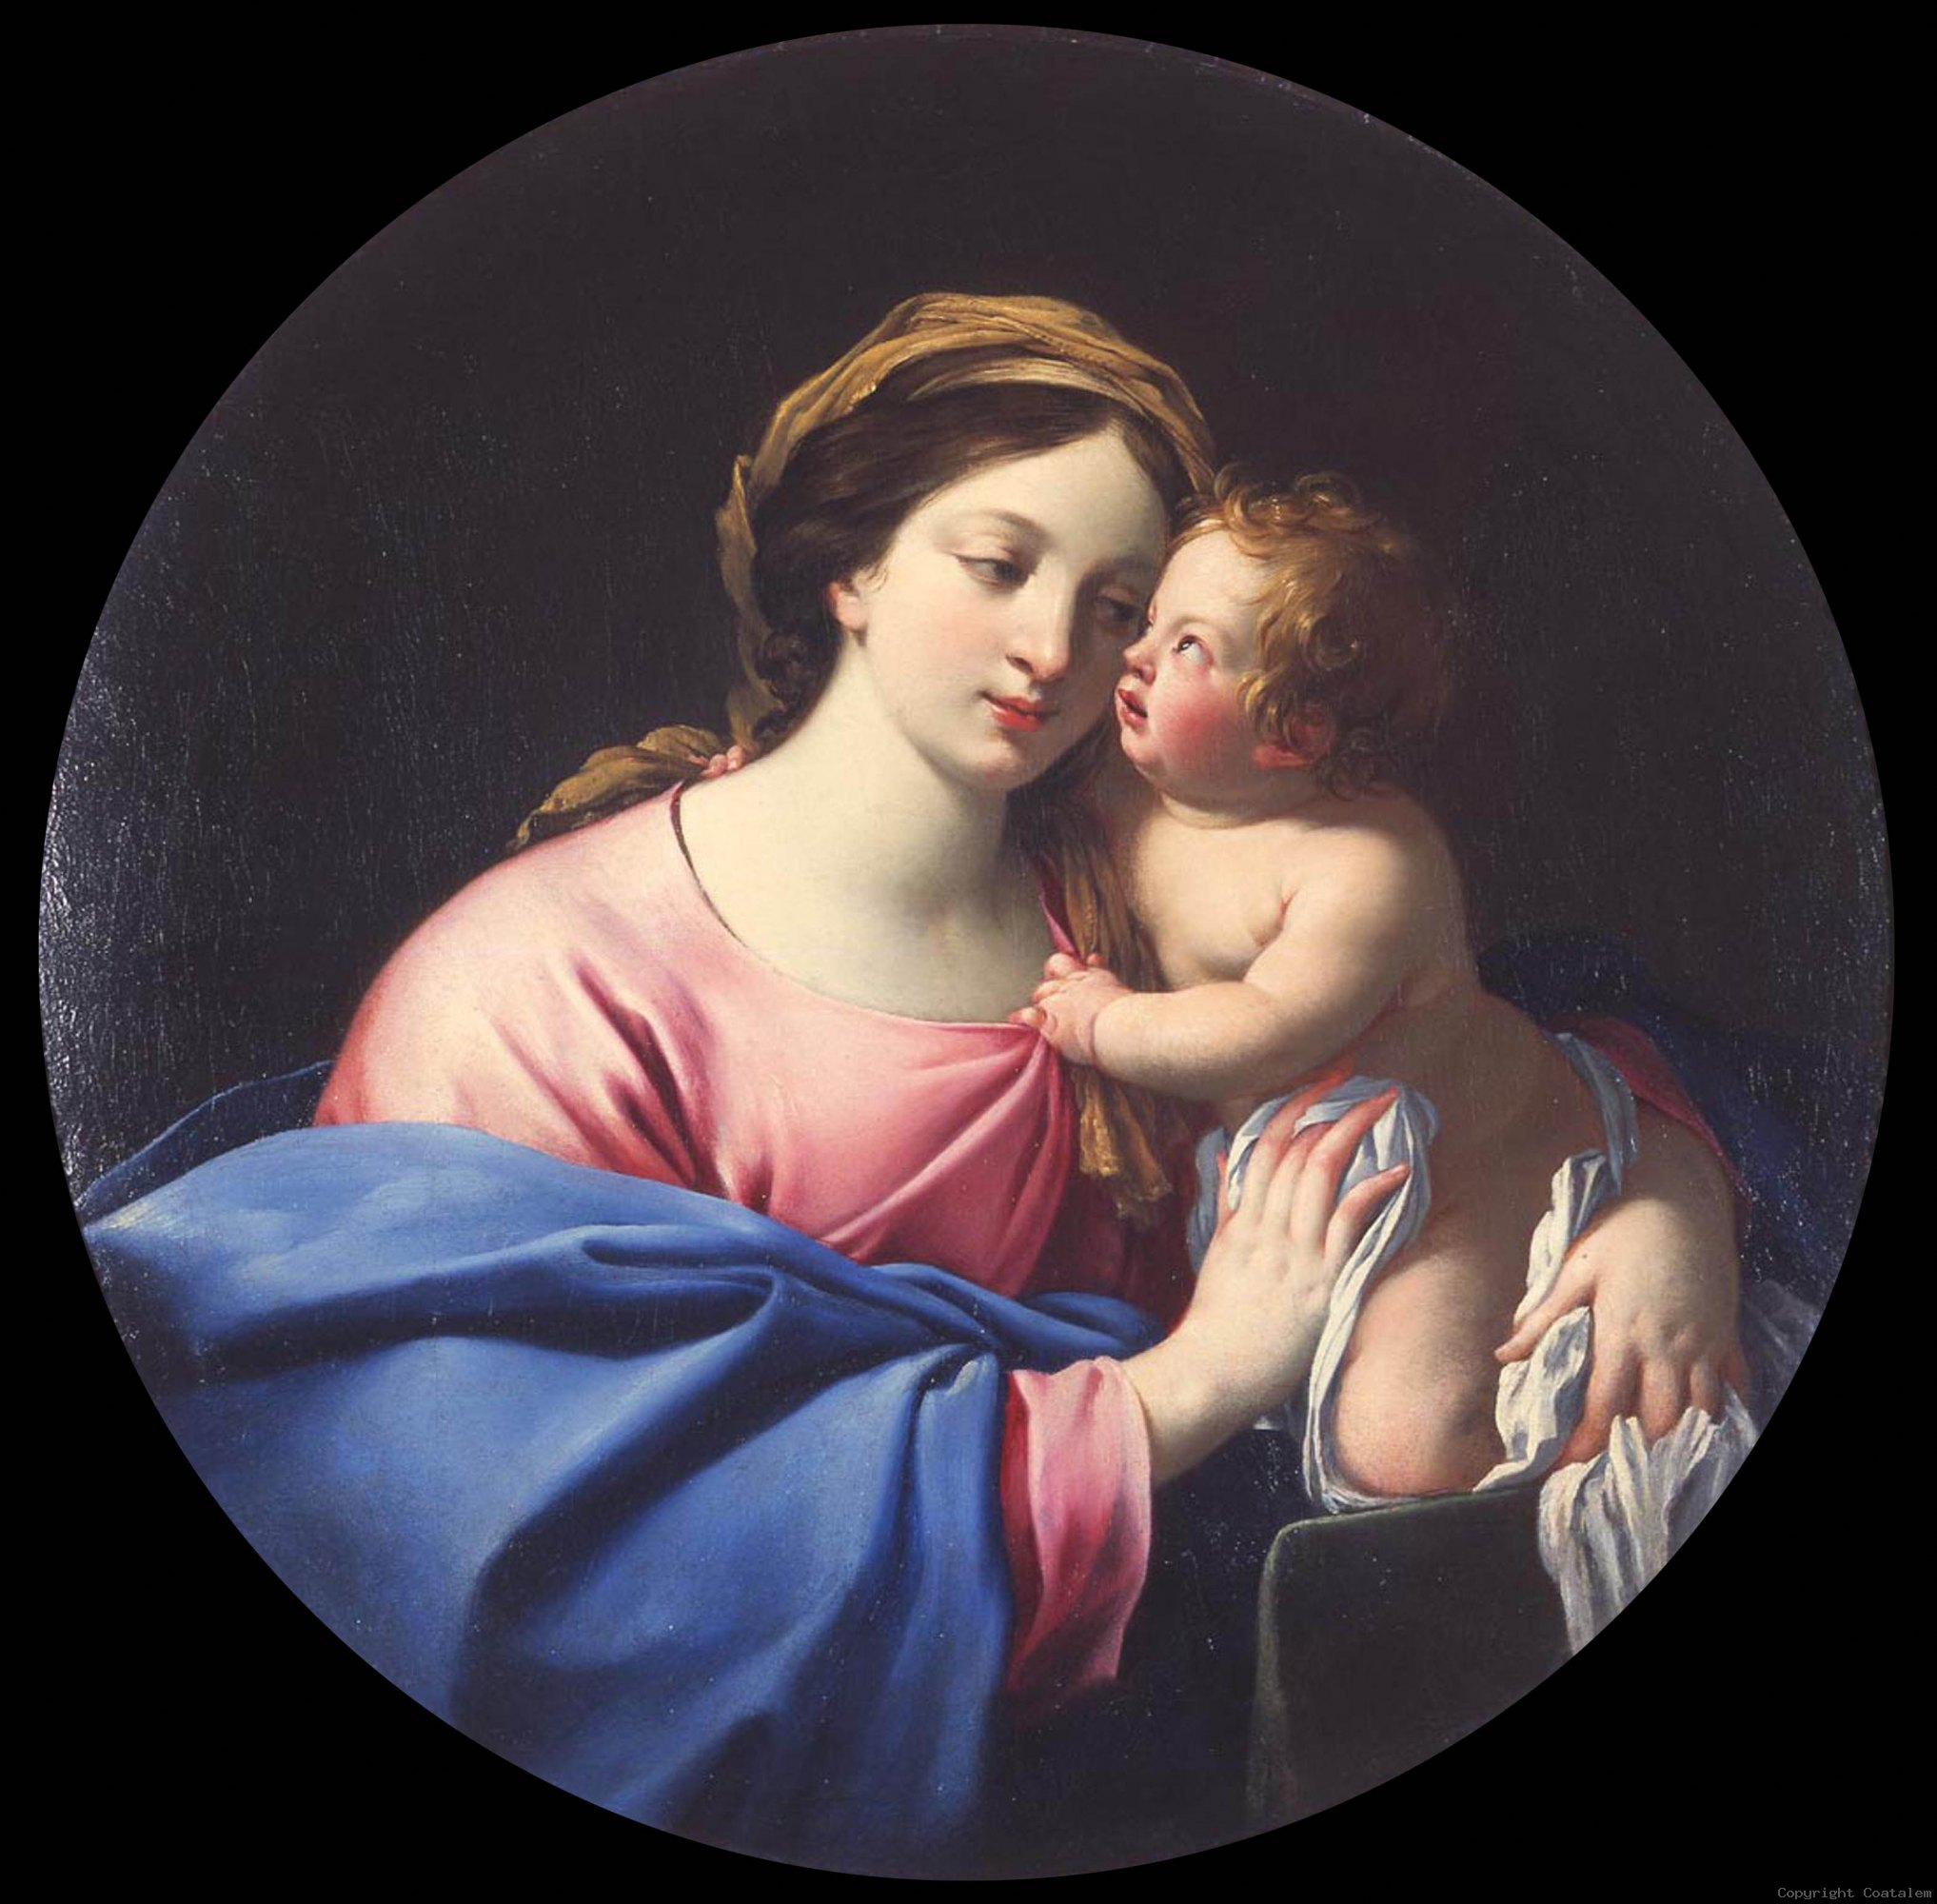 embarazada francaise